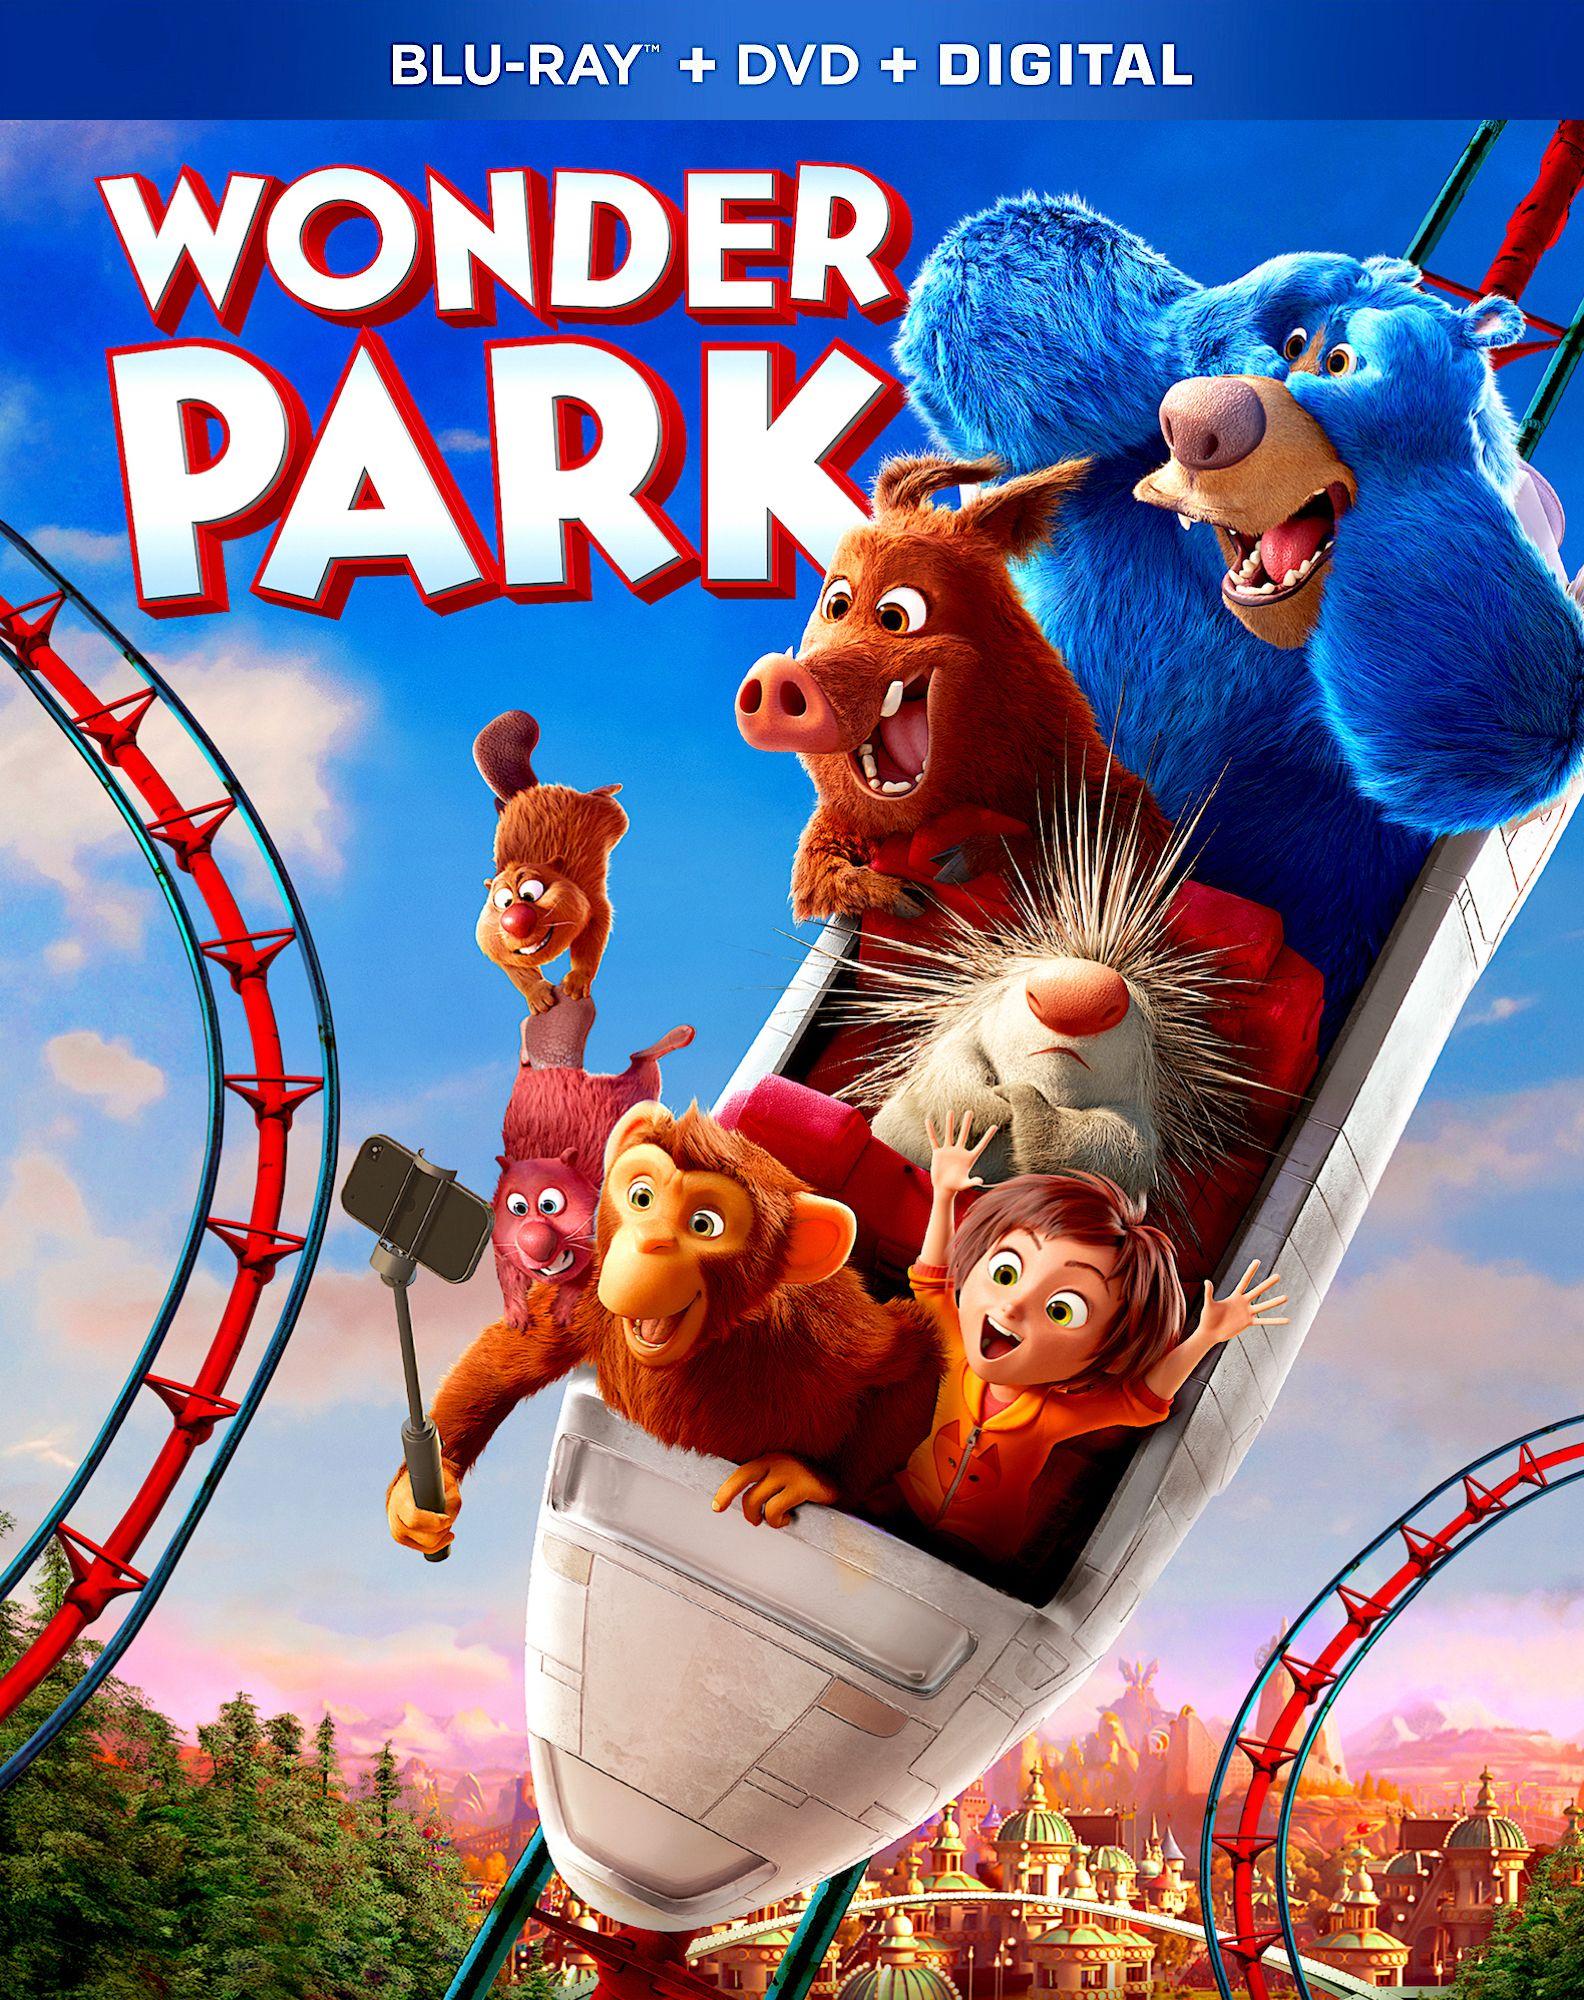 Wonder Park Blu Ray Paramount Creative Girl Names Full Movies Free Movies Online